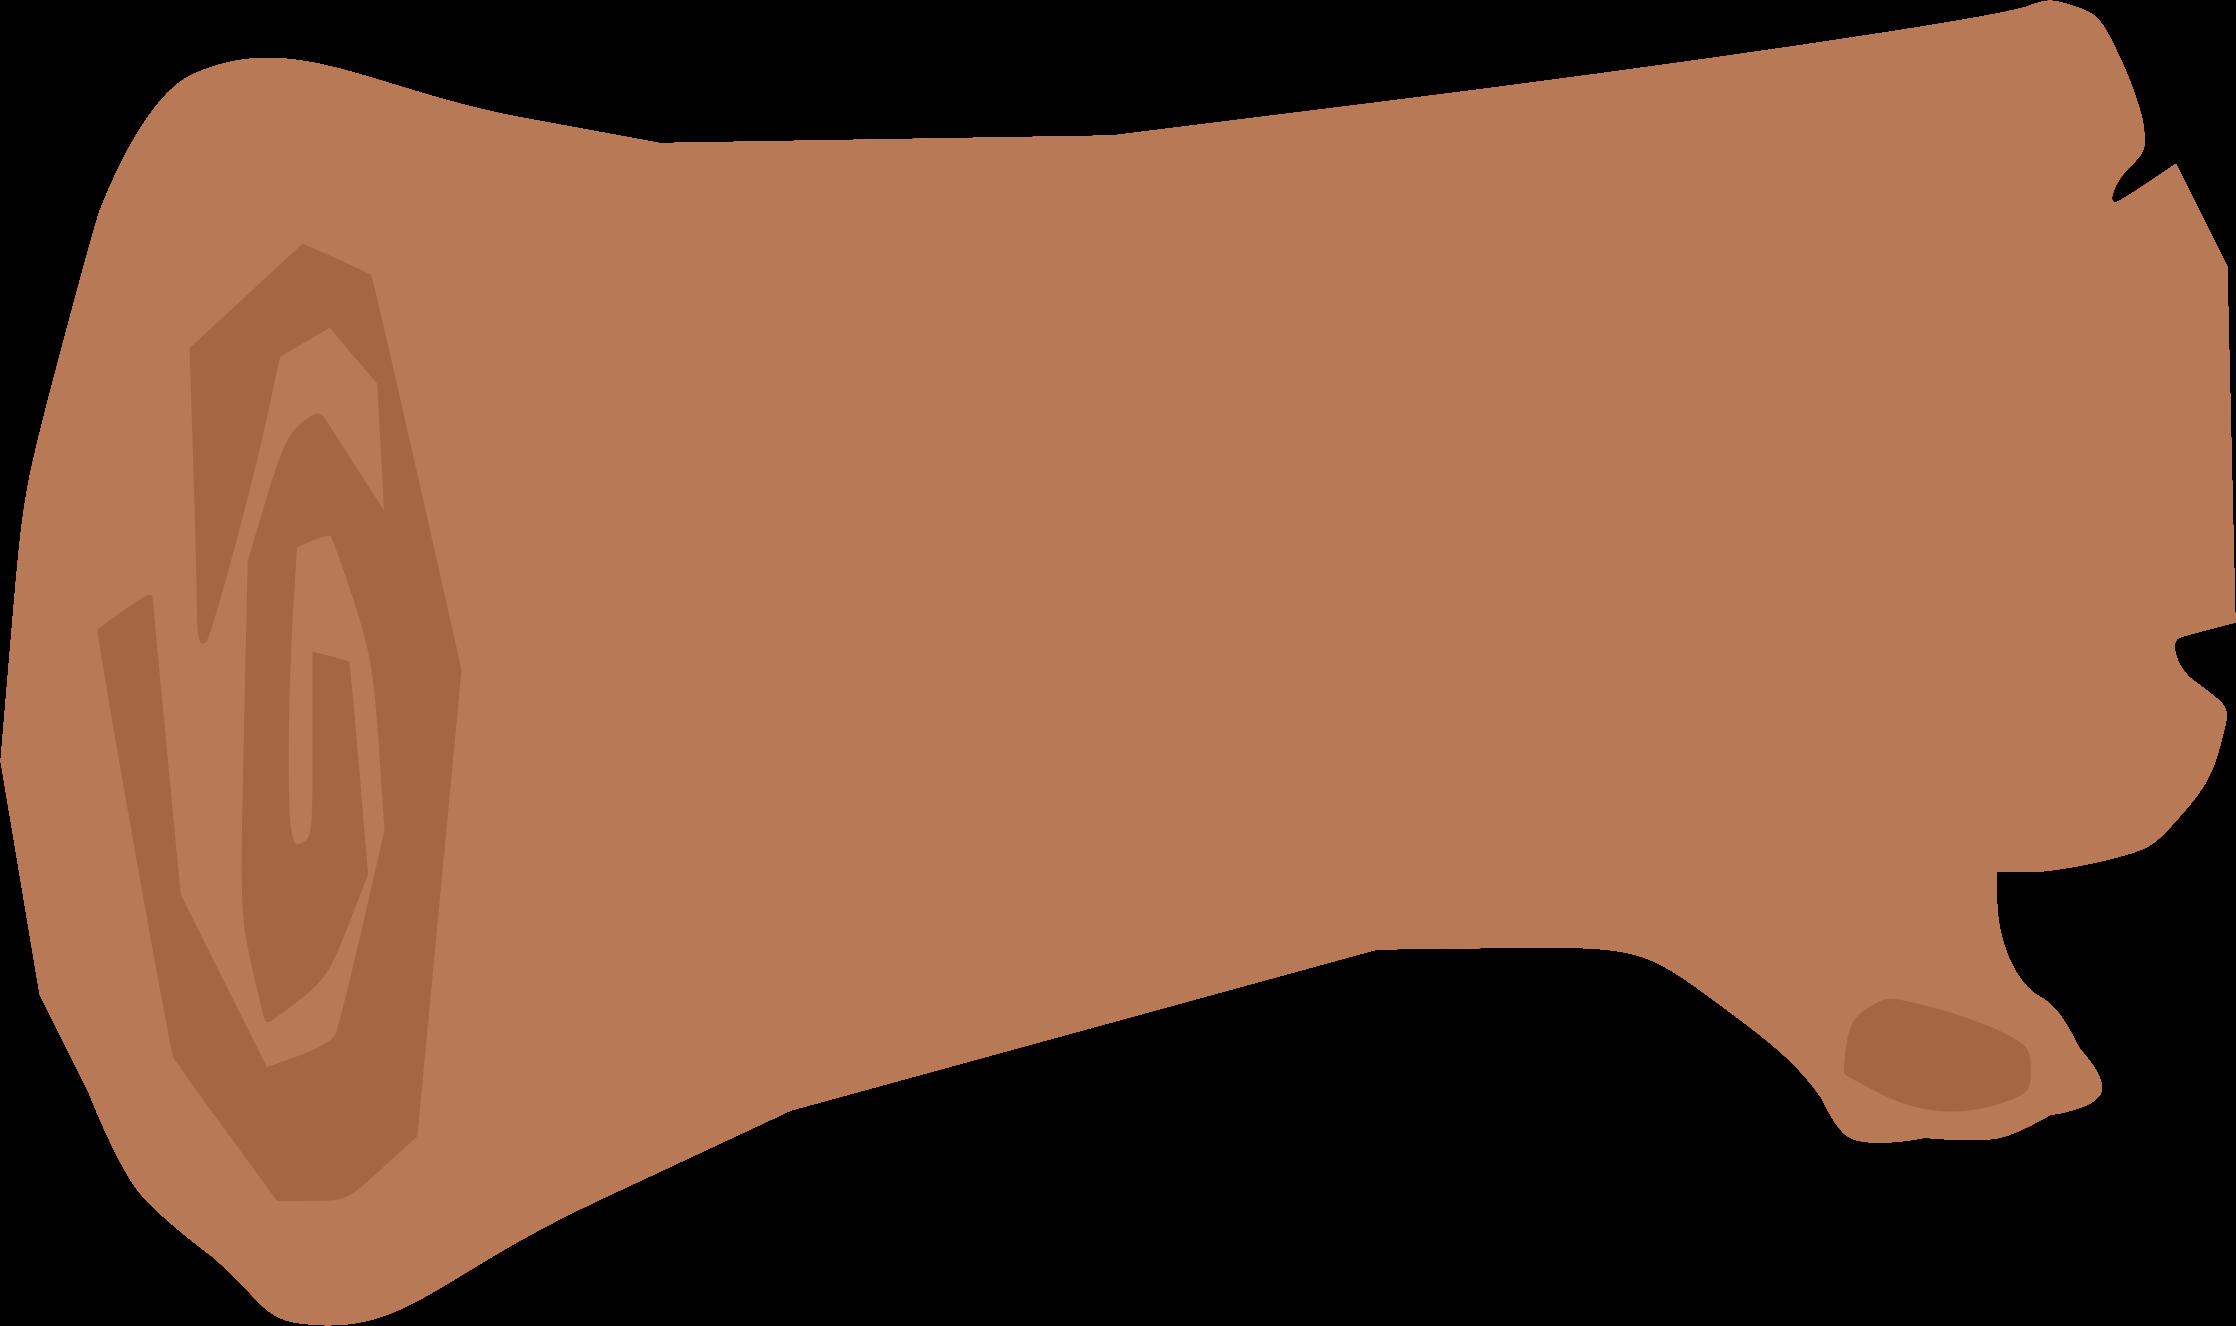 Log nicholasjudy big image. Logs clipart brown thing